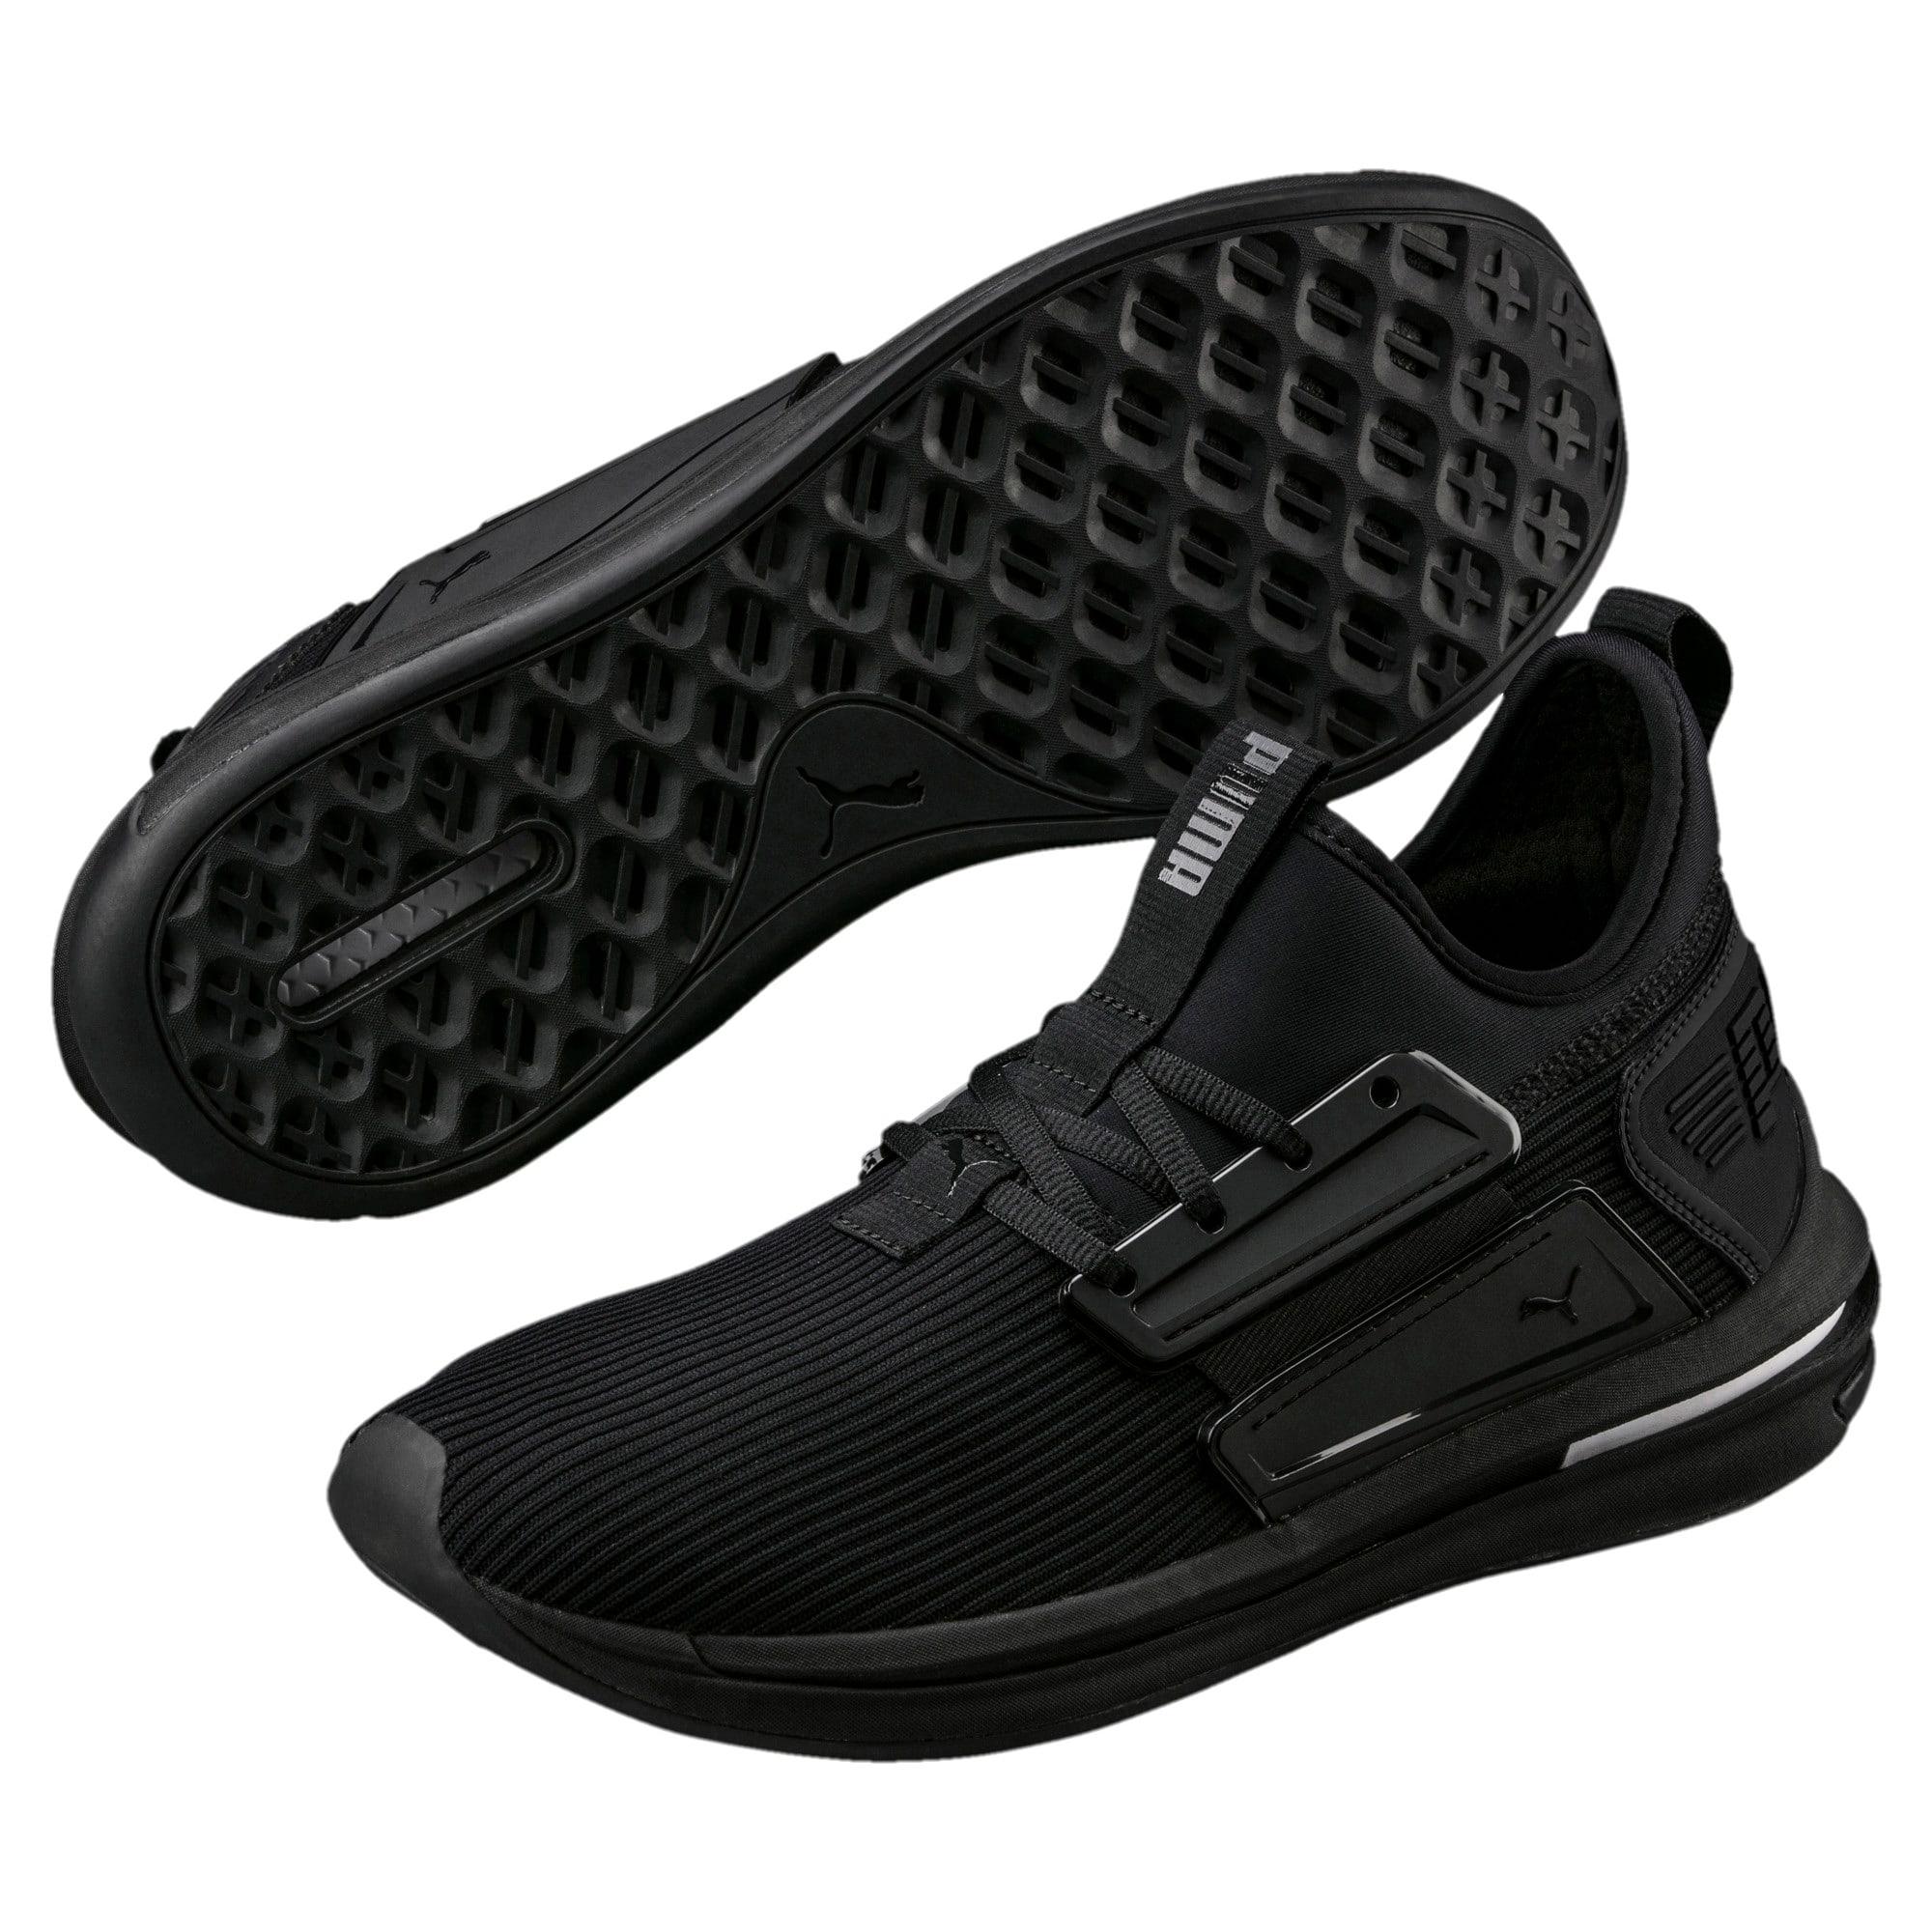 Thumbnail 2 of IGNITE Limitless SR Men's Running Shoes, Puma Black, medium-IND